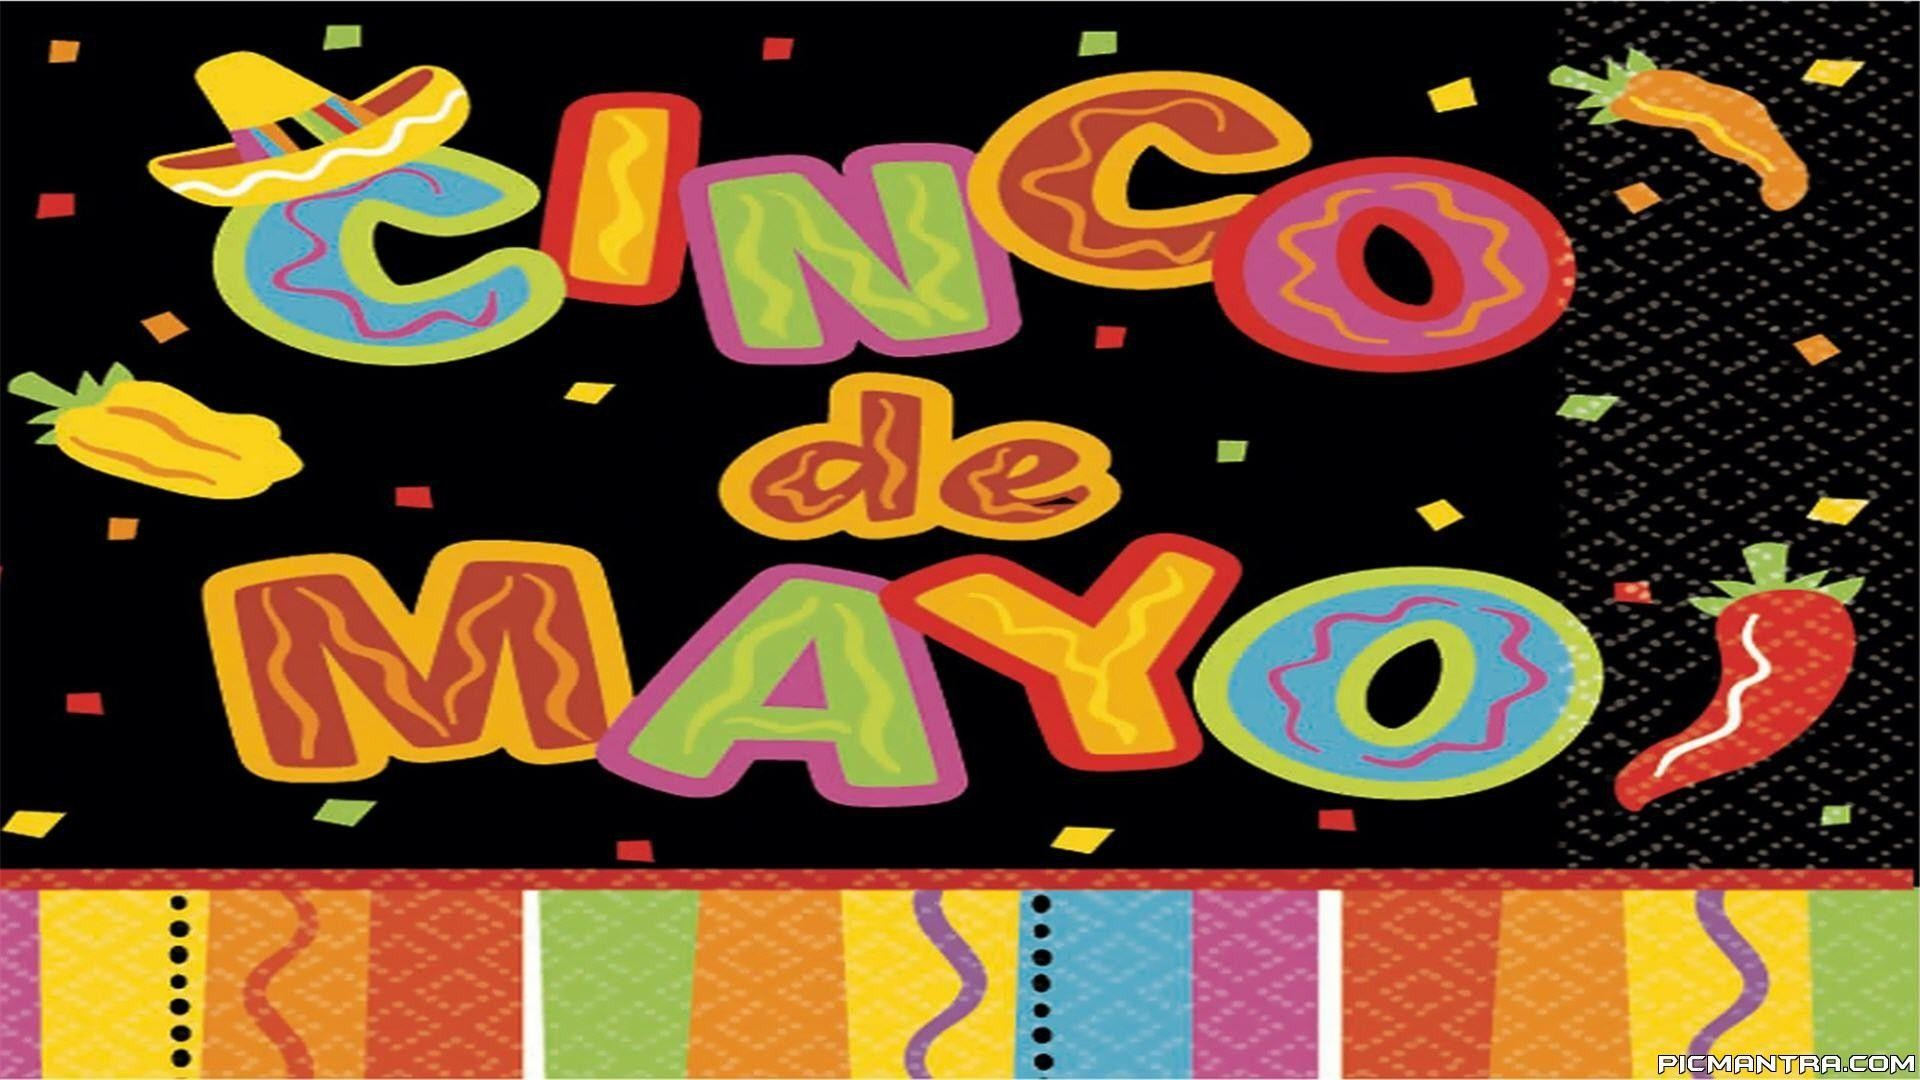 Best Looking Cars Wallpapers Cinco De Mayo Wallpapers 57 Images